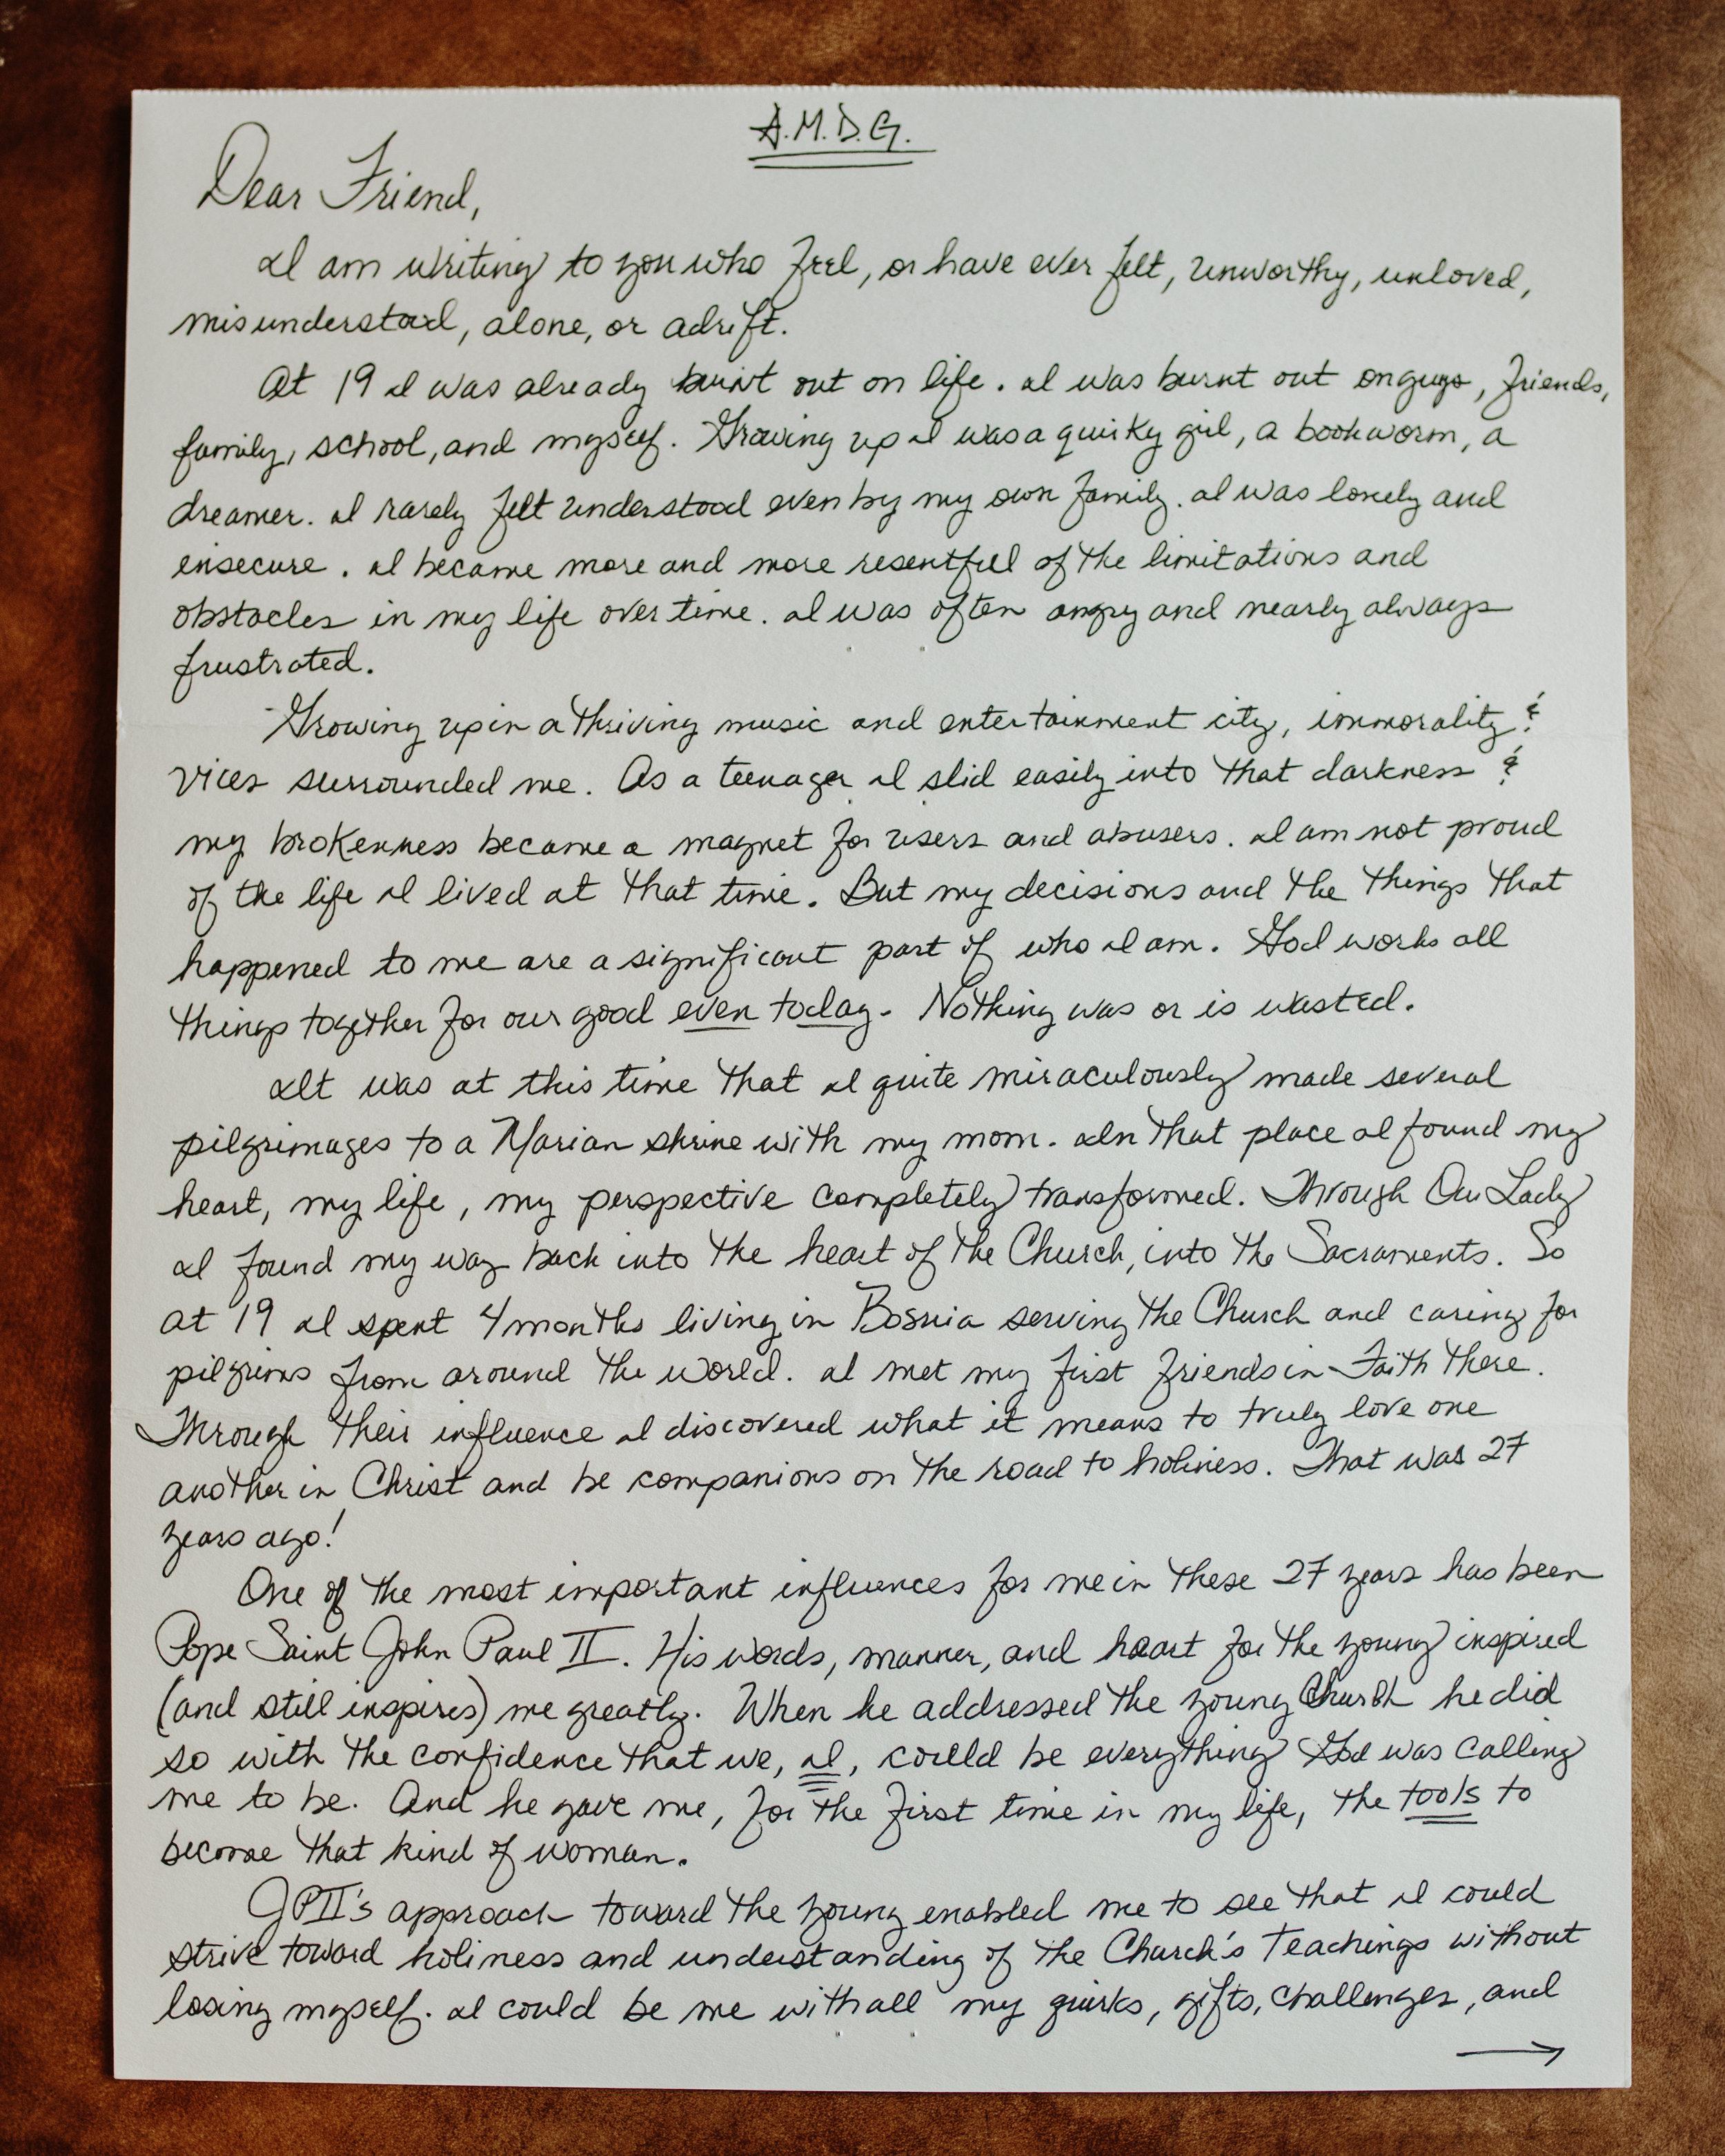 Christine Baglow The Catholic Woman Letter to Women 1